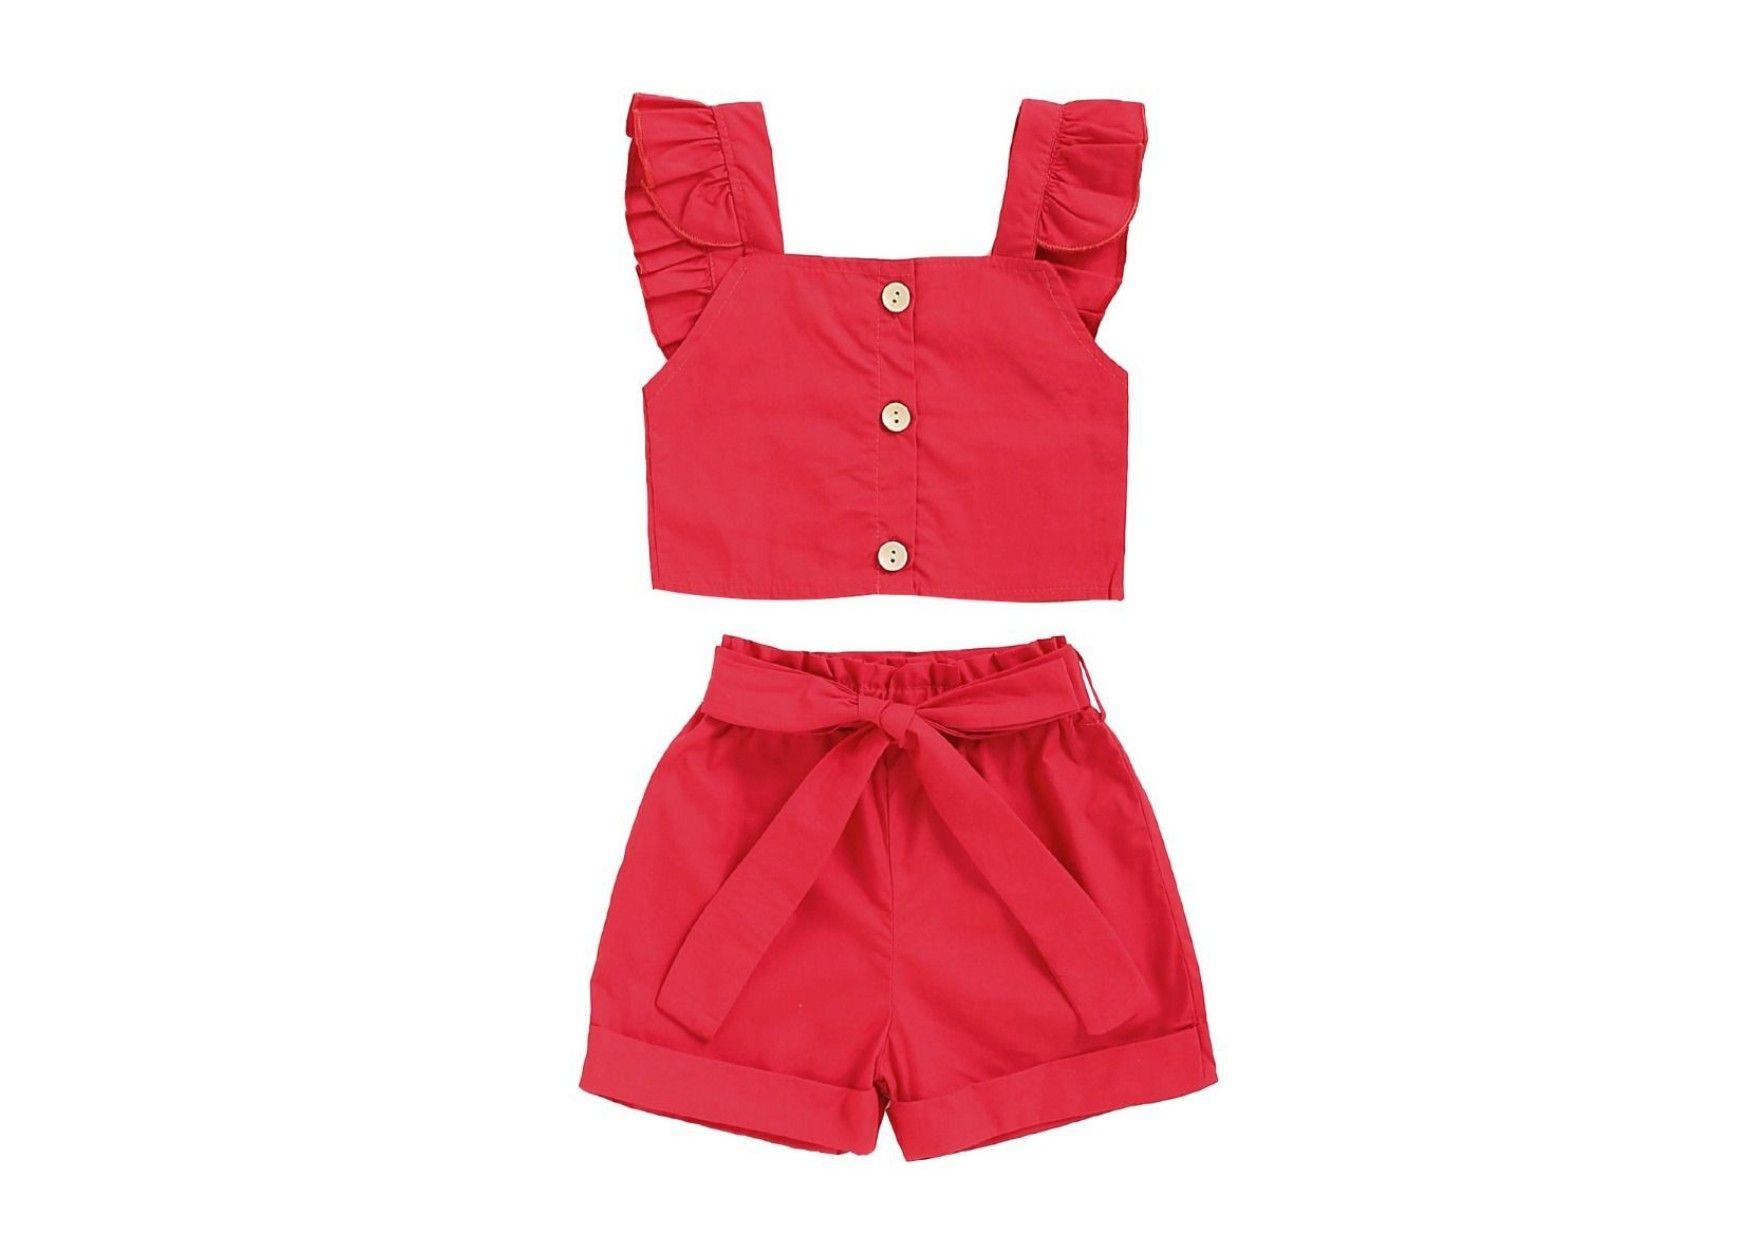 Infant Baby Toddler Girl Summer Clothes 3pc Off Shoudler Flower T-Shirt Denim Shorts Headband Kehen